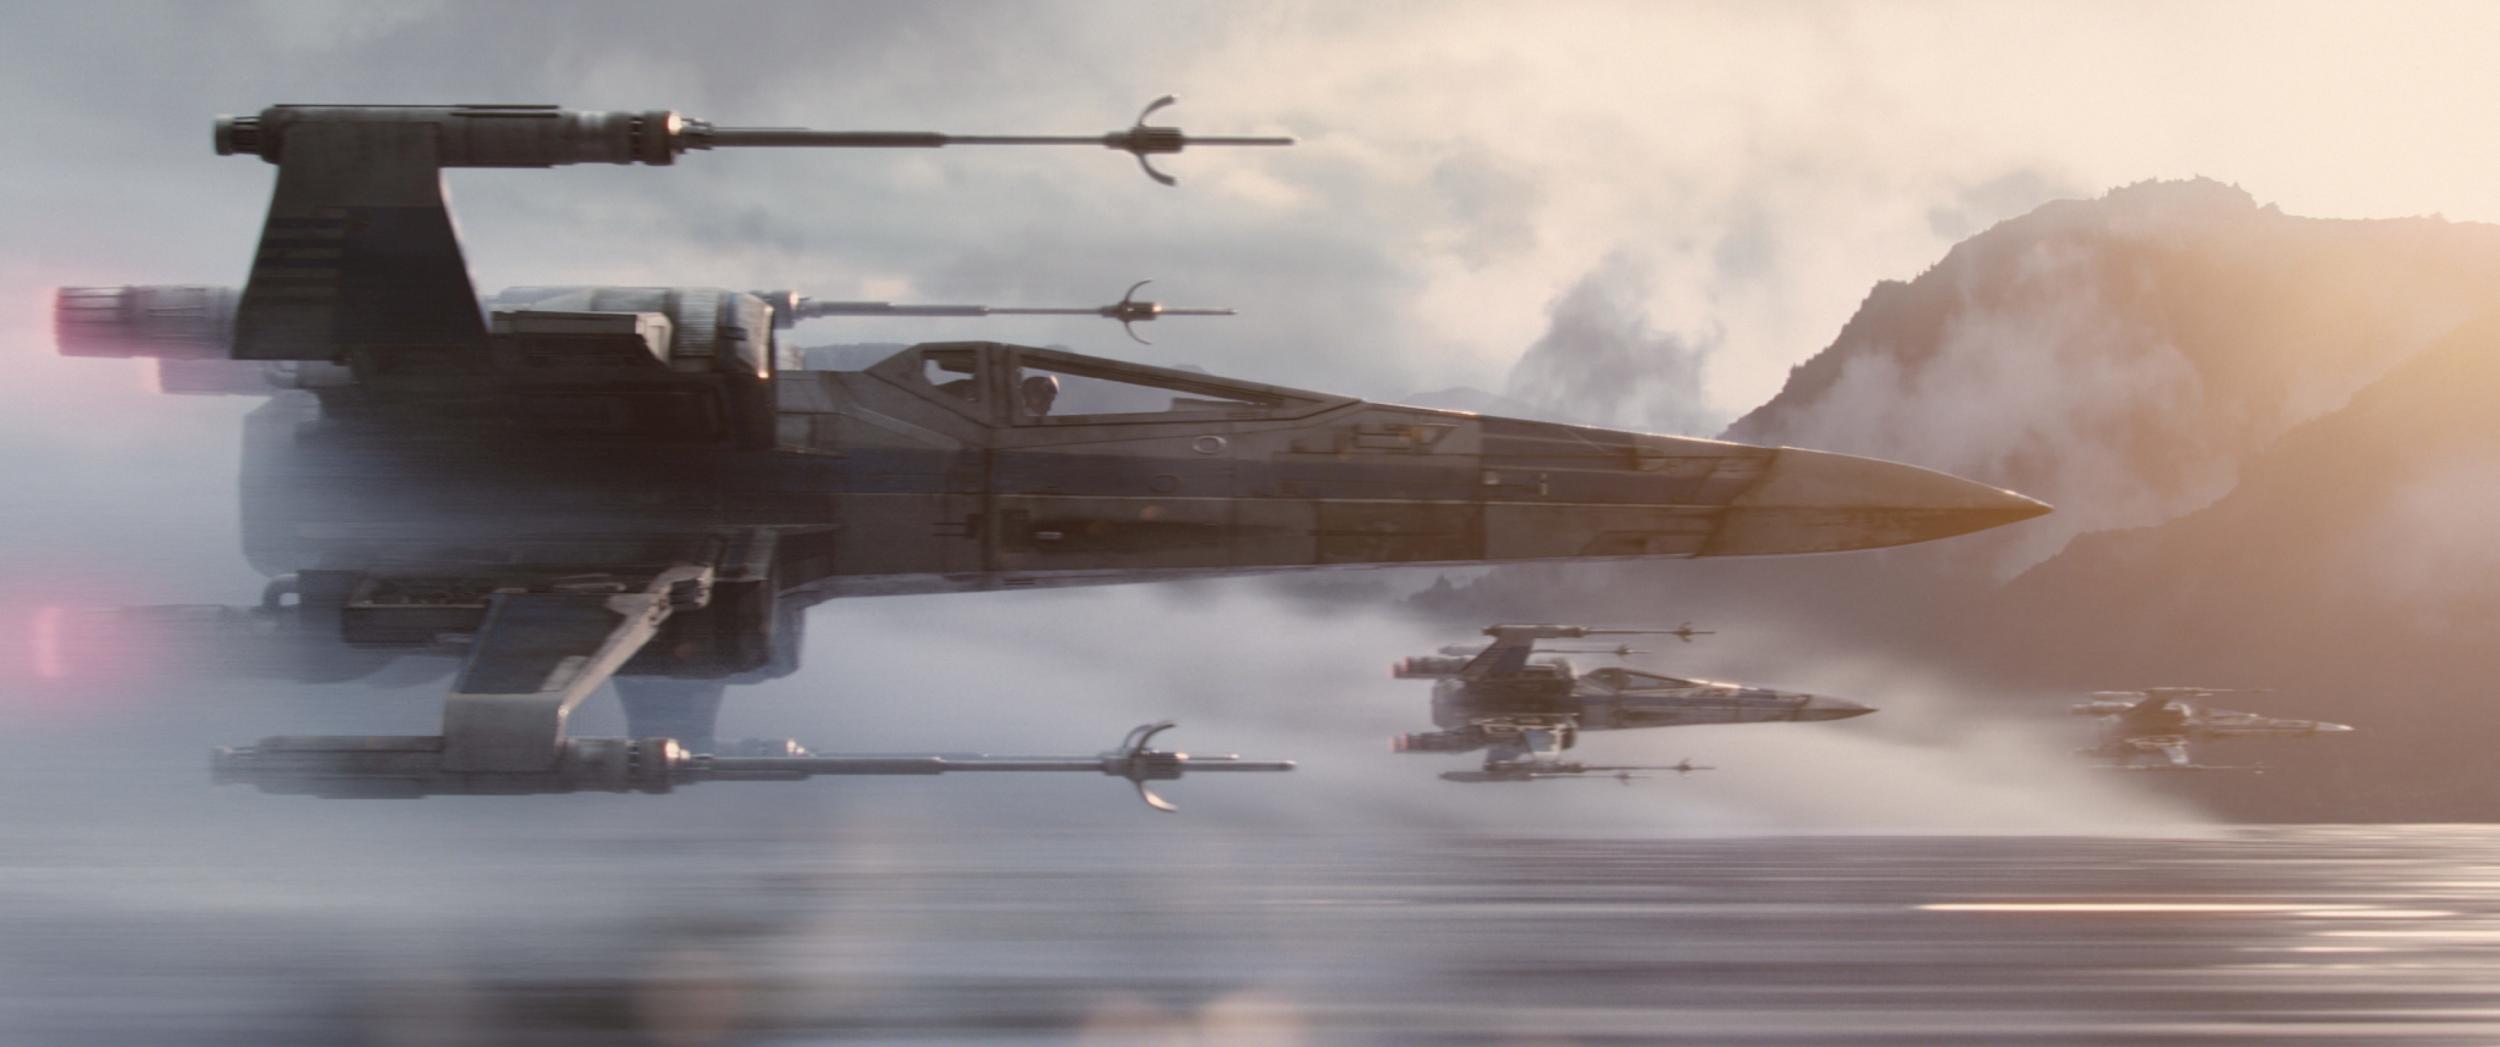 star-wars-force-awakens-black-squadron